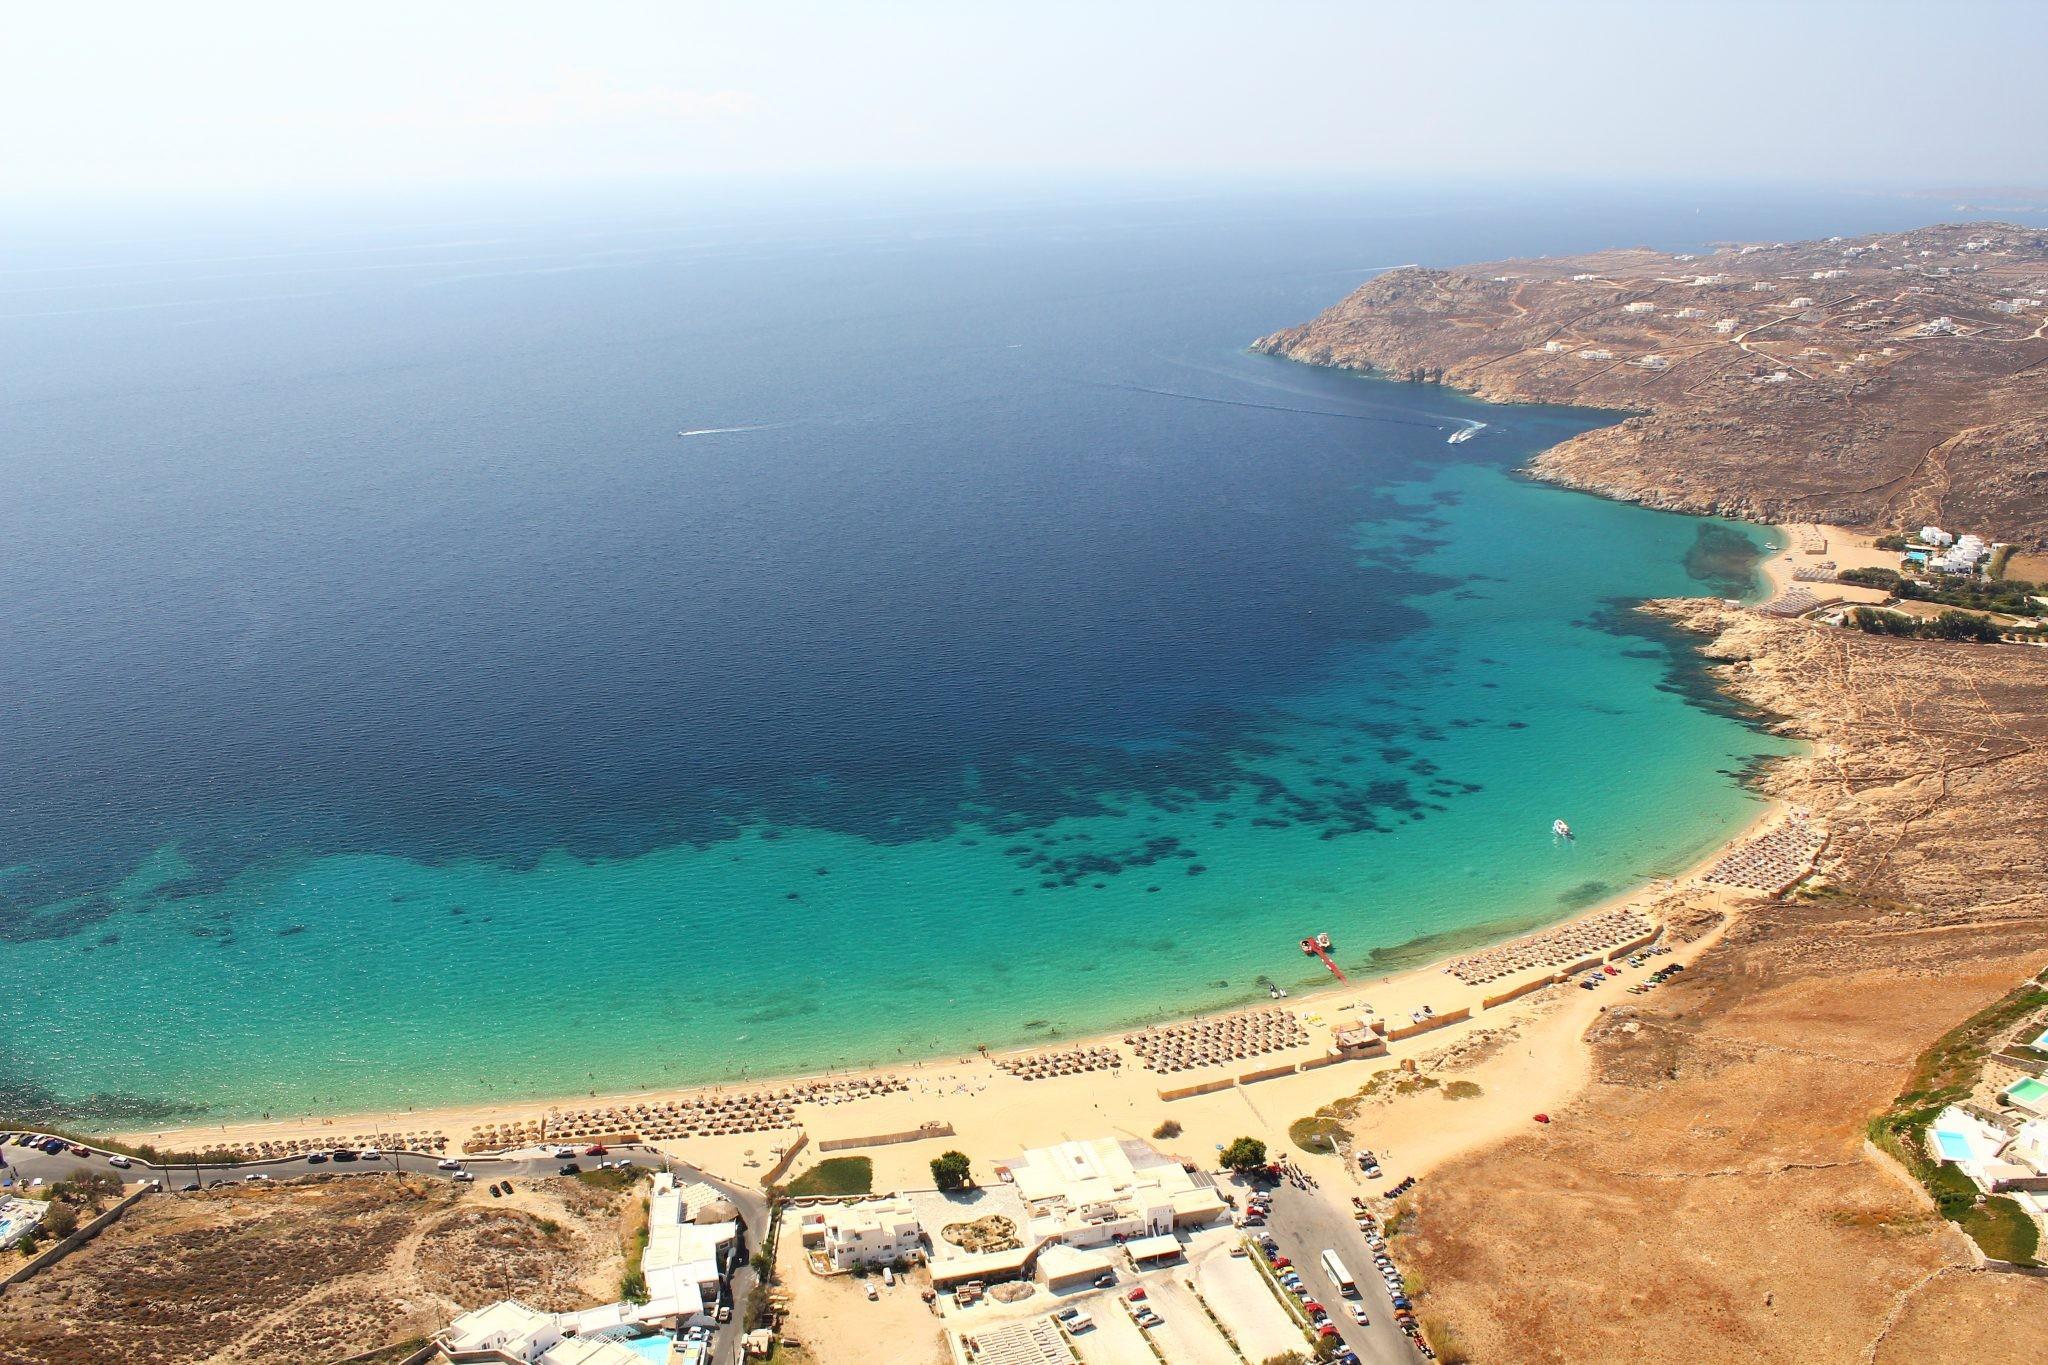 Terreno, Mykonos - Ref GR-4311-S